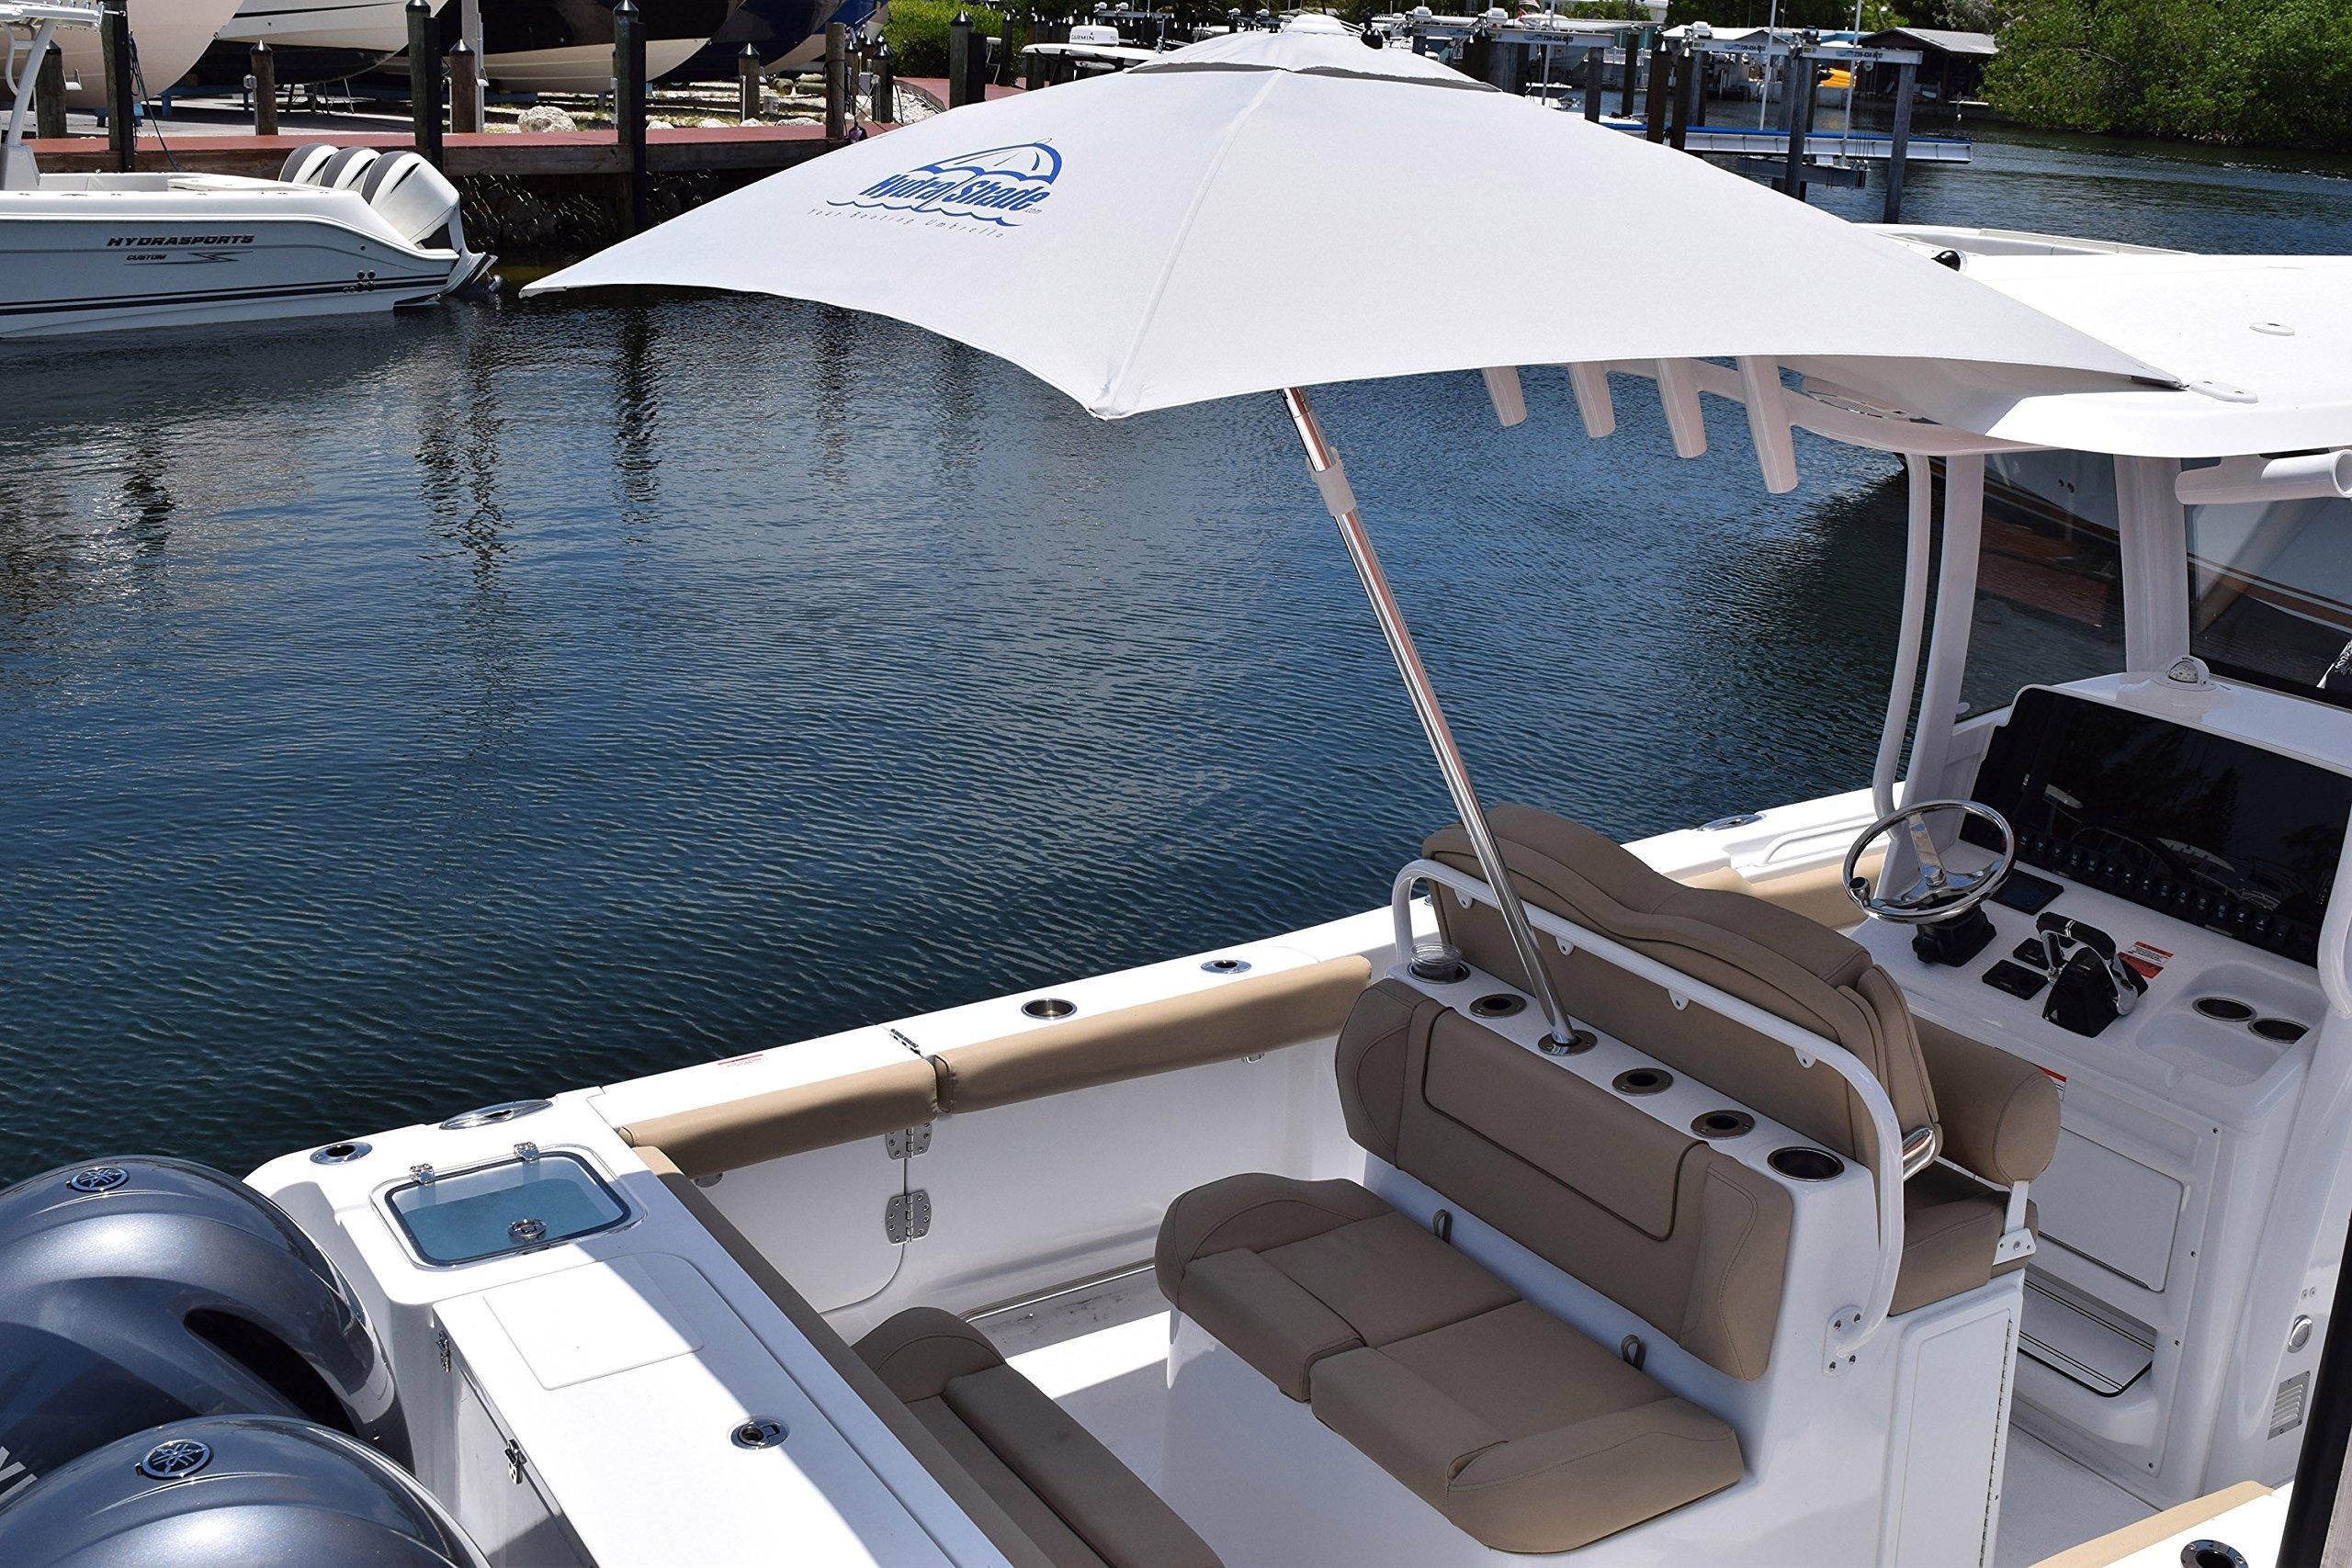 Hospitality Rattan XL-150 Hydra Shade 8' Square Boating & Beach Umbrella Kit, White by Hospitality Rattan (Image #3)